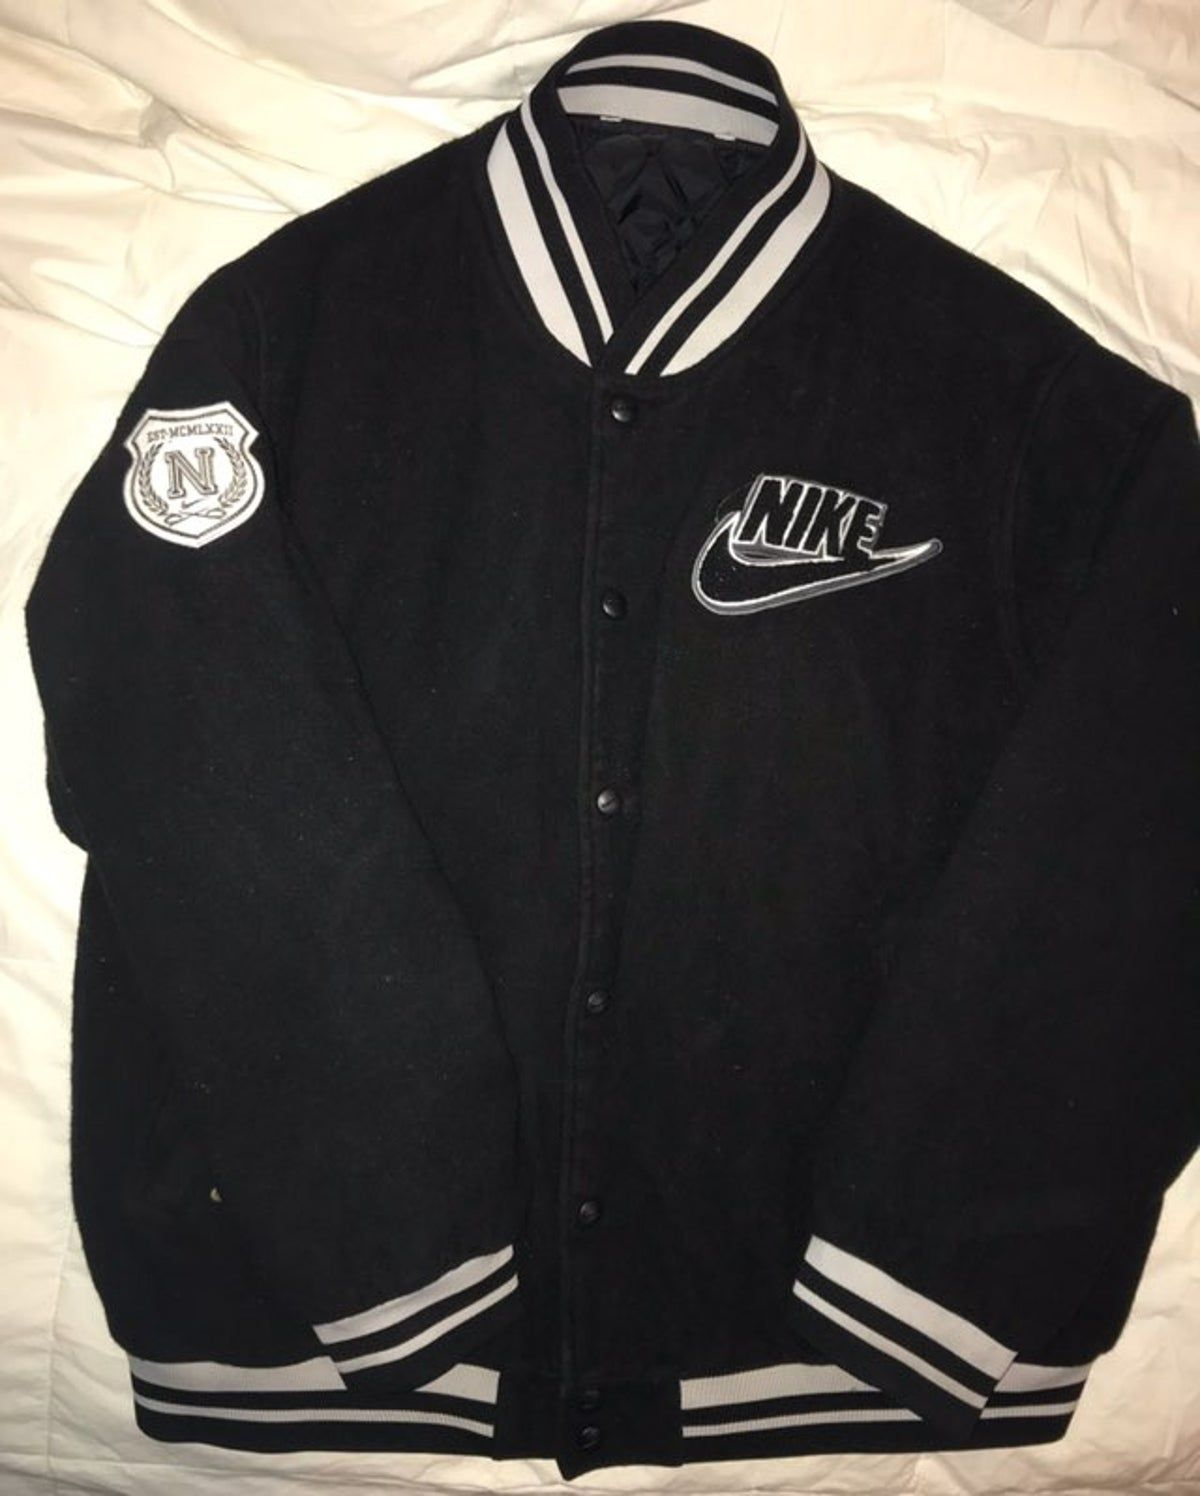 Jackets For Men Jackets Mens Jackets Vintage Nike [ 1496 x 1200 Pixel ]